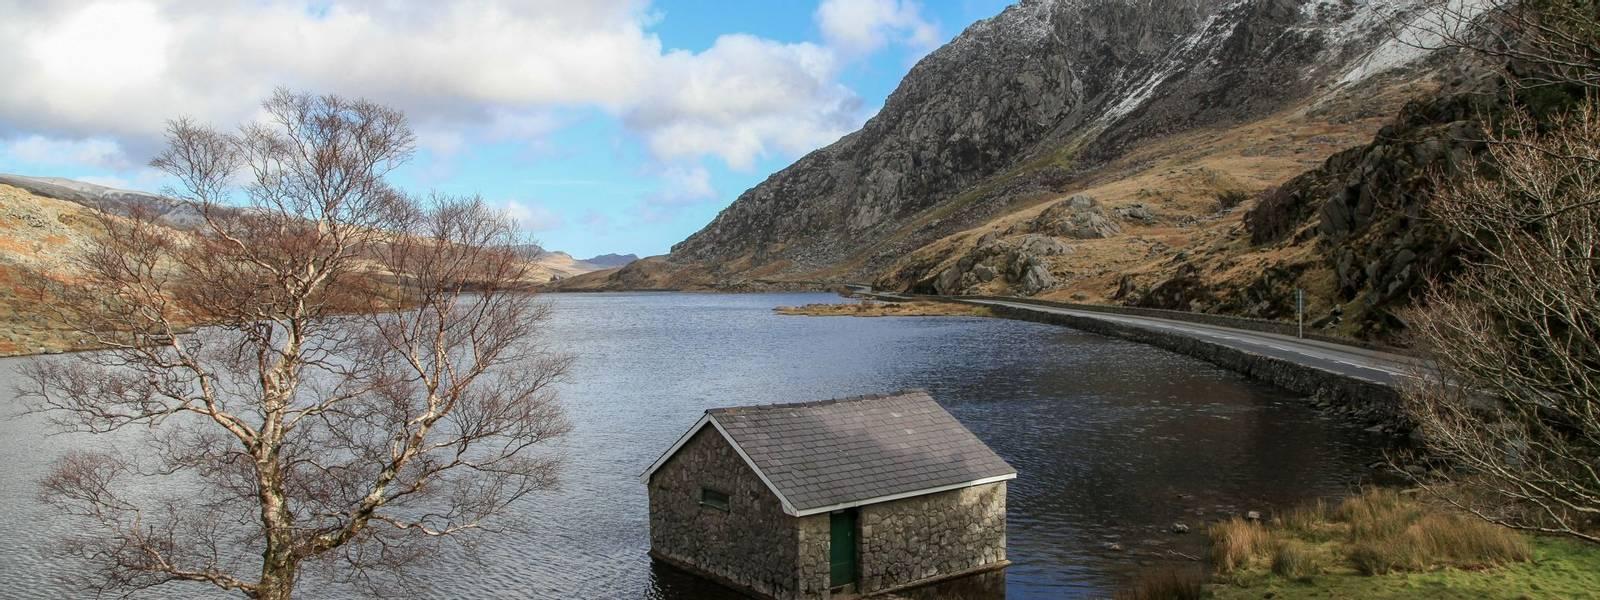 Northern Snowdonia - Walking with Sightseeing - AdobeStock_80319241.jpeg